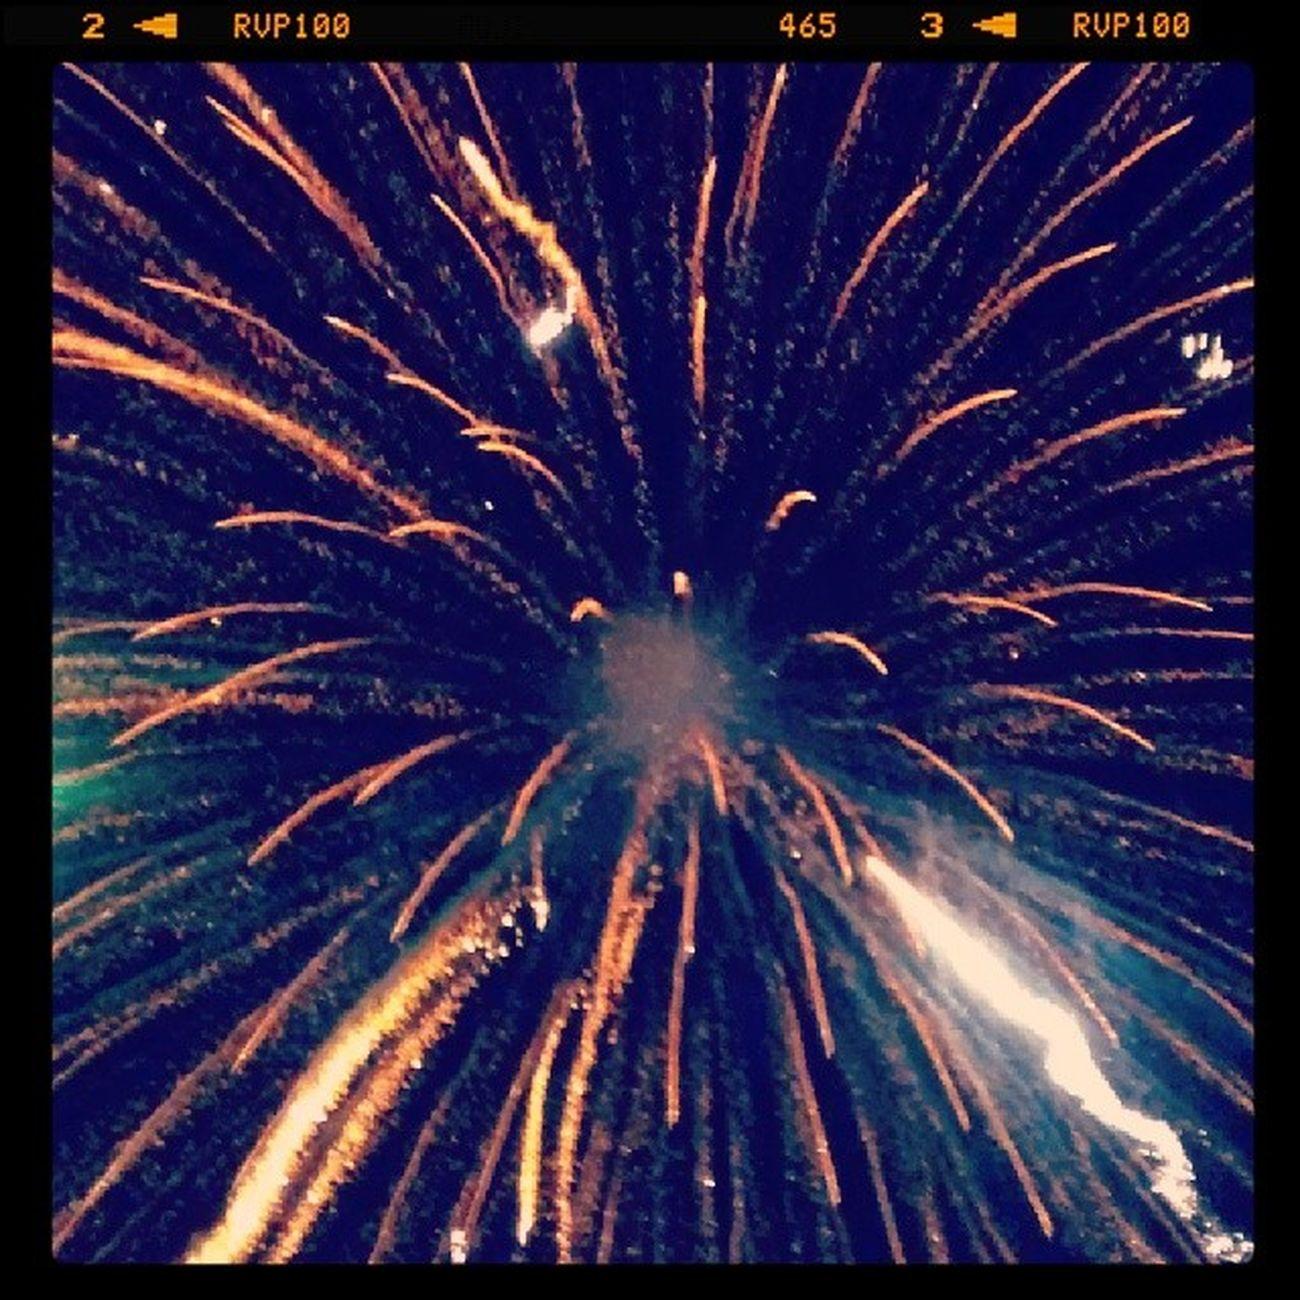 Batallanaval Mazatlan Carnaval Fireworks